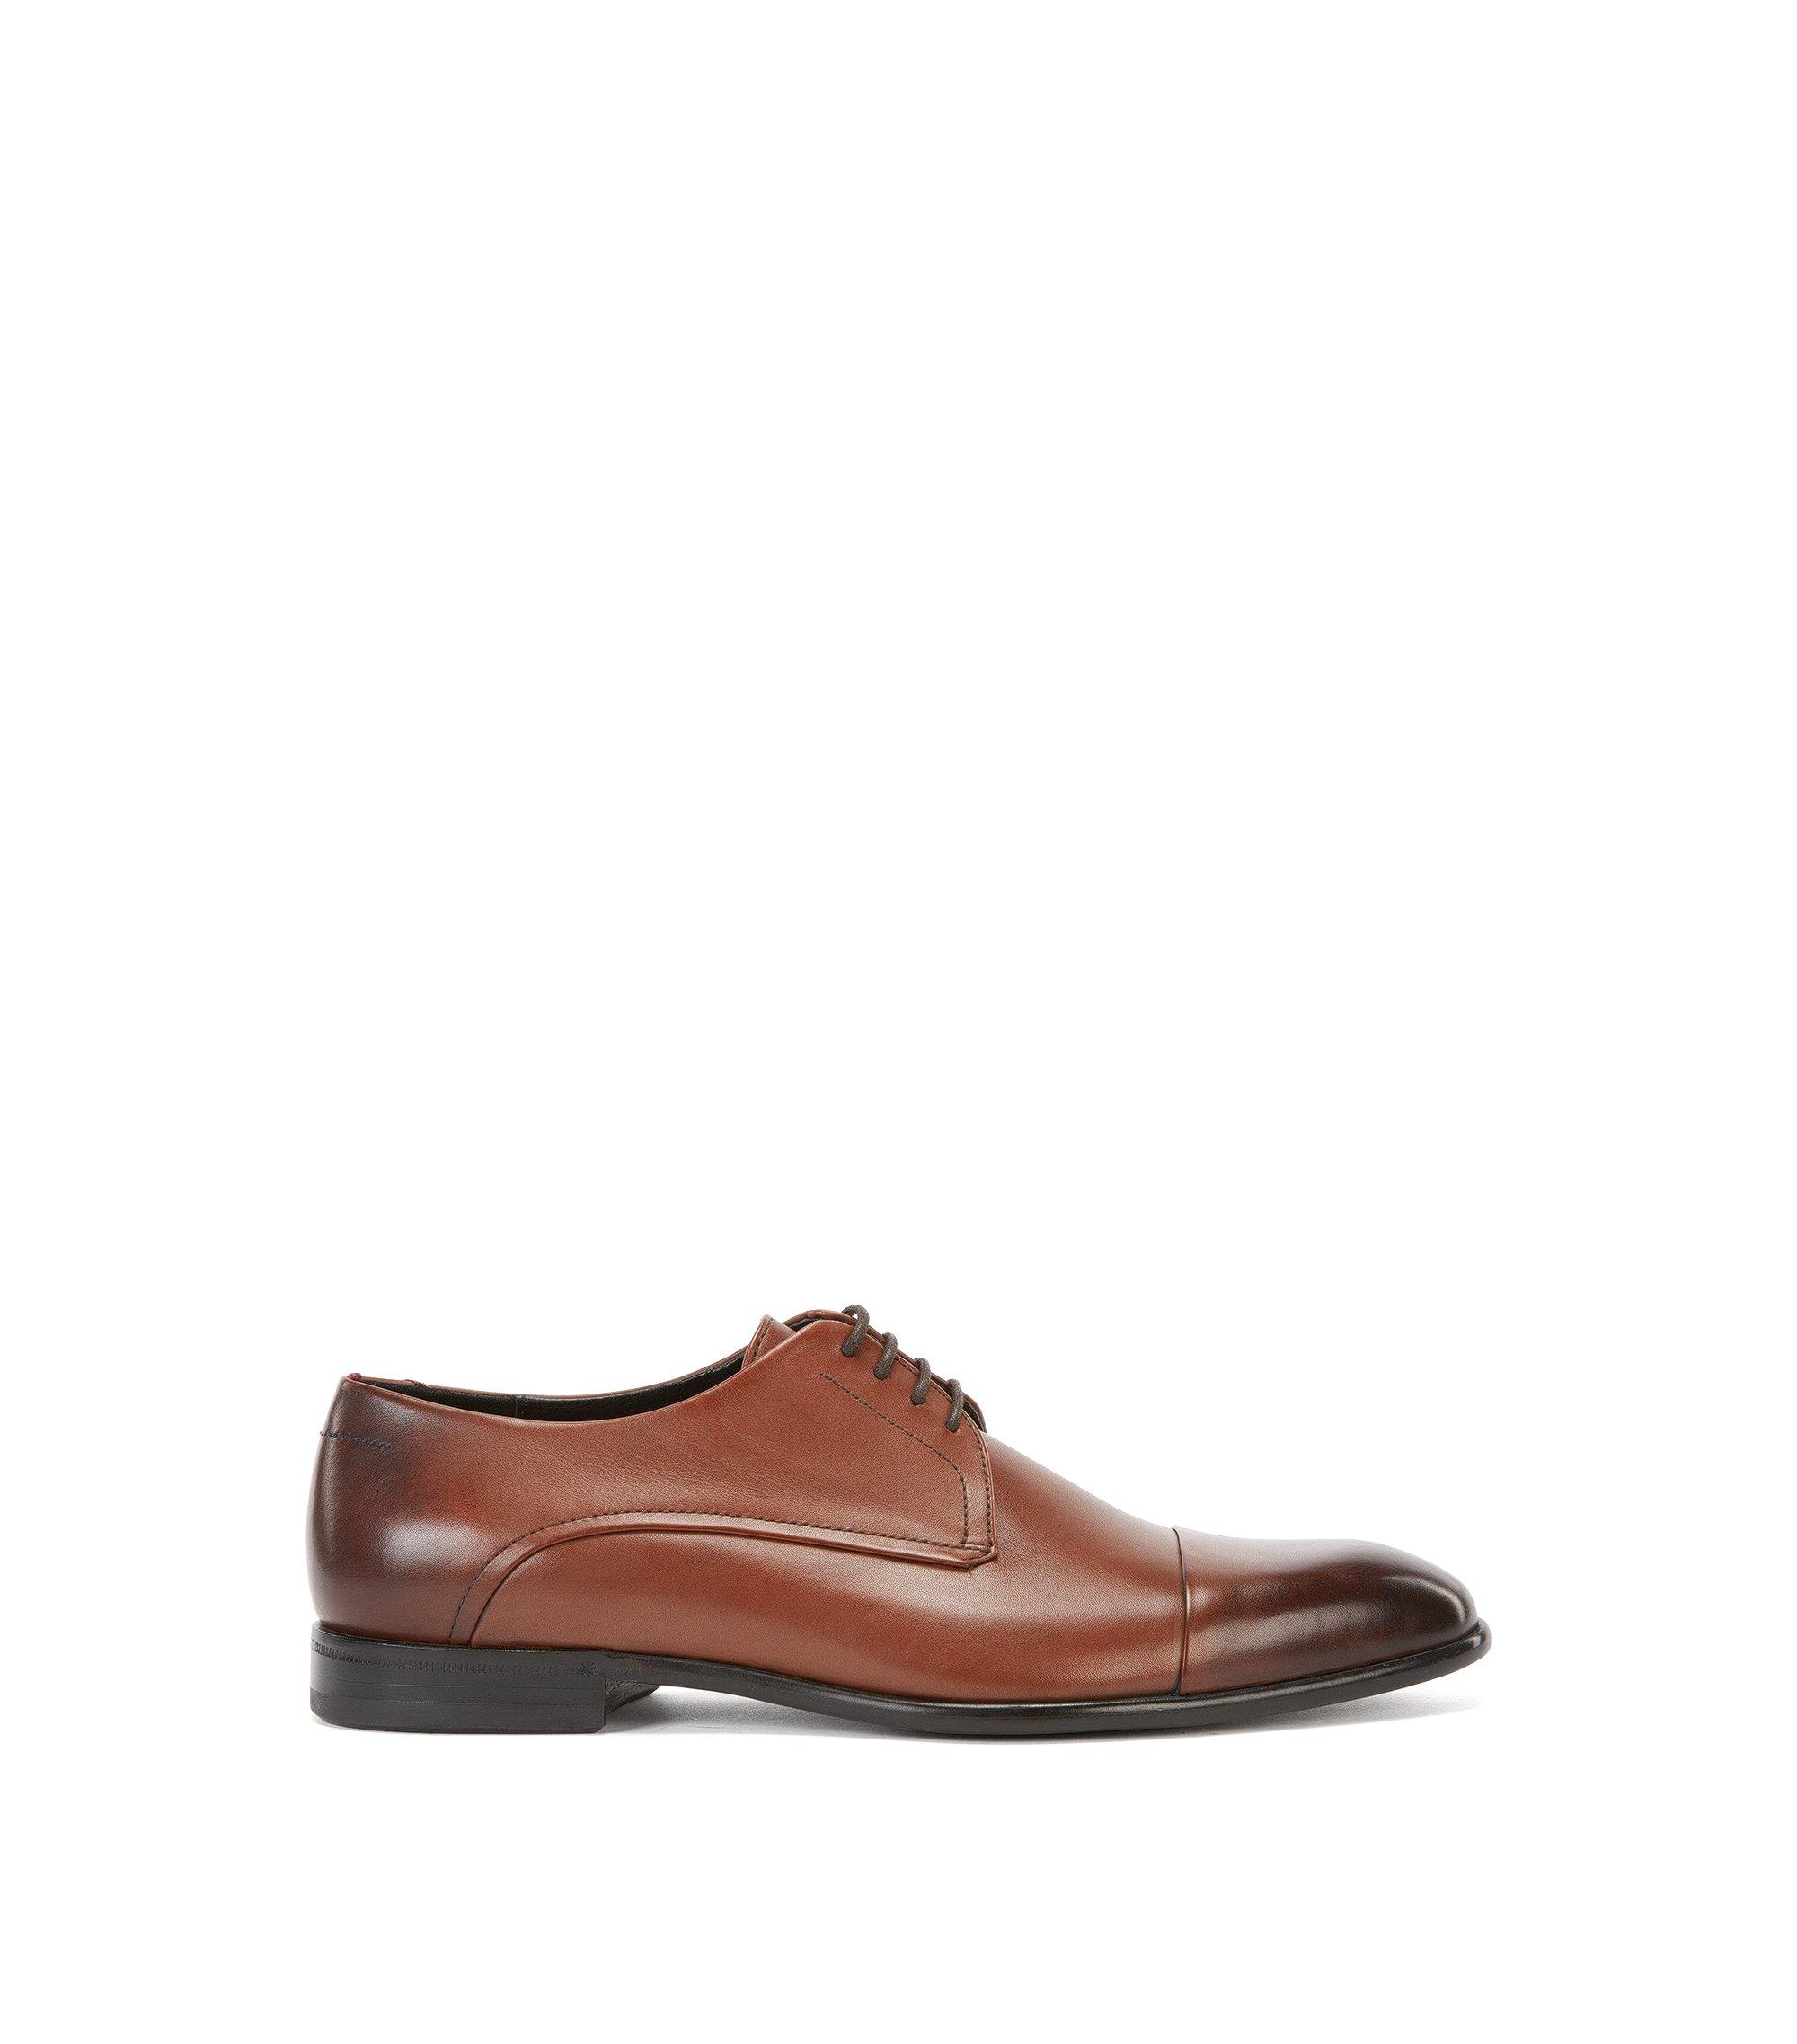 Chaussures derby en cuir poli haut de gamme , Marron